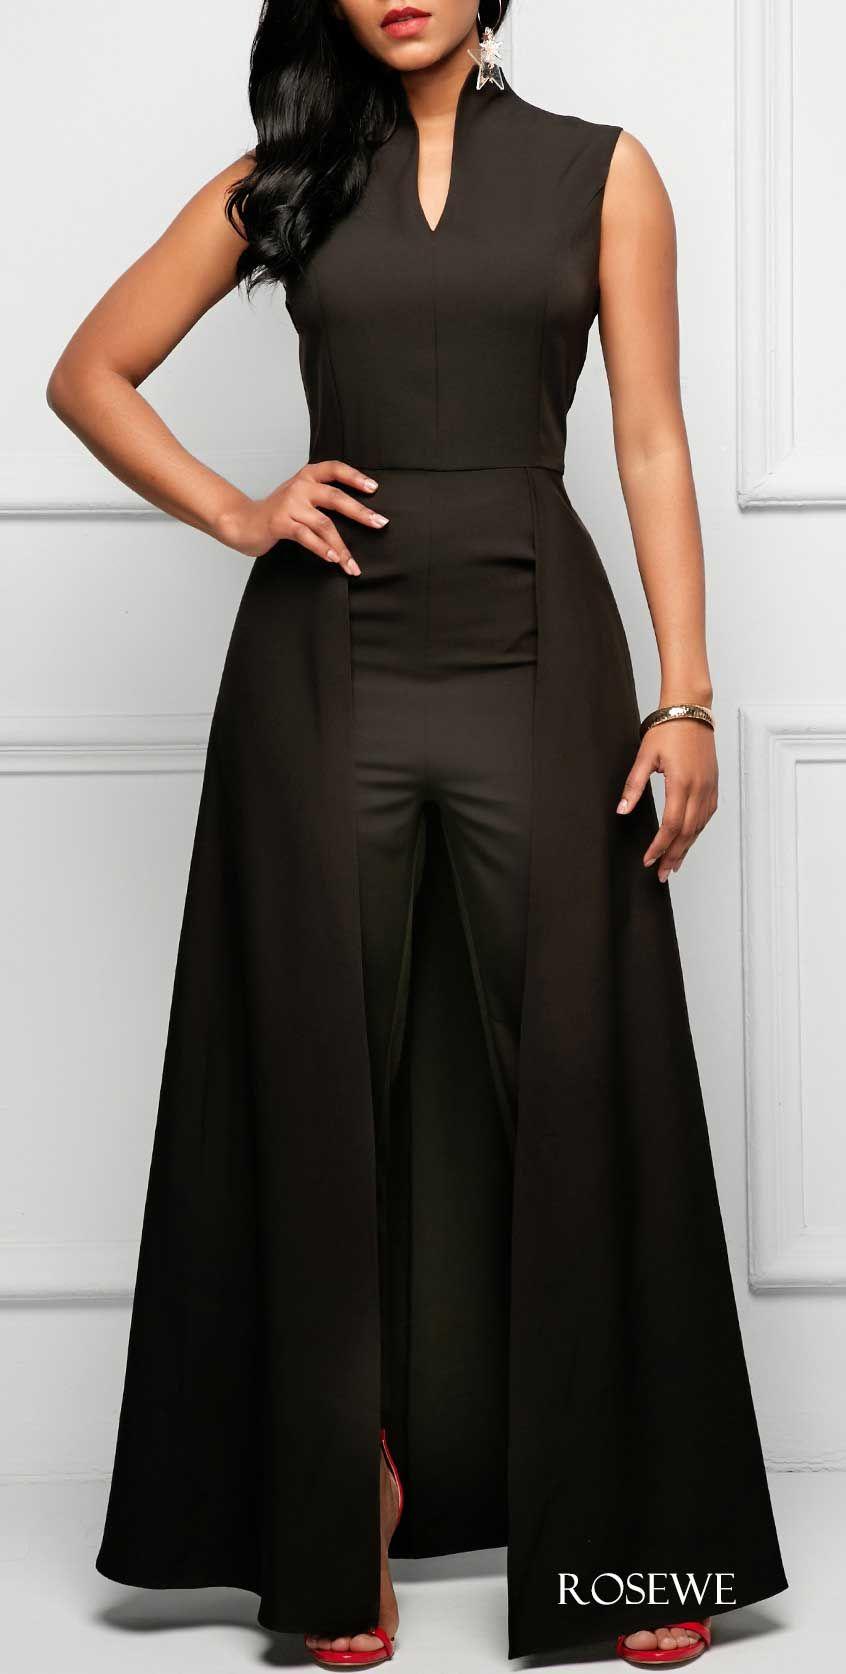 a3f6b53dd64 Elegant jumpsuit for women at Rosewe.com